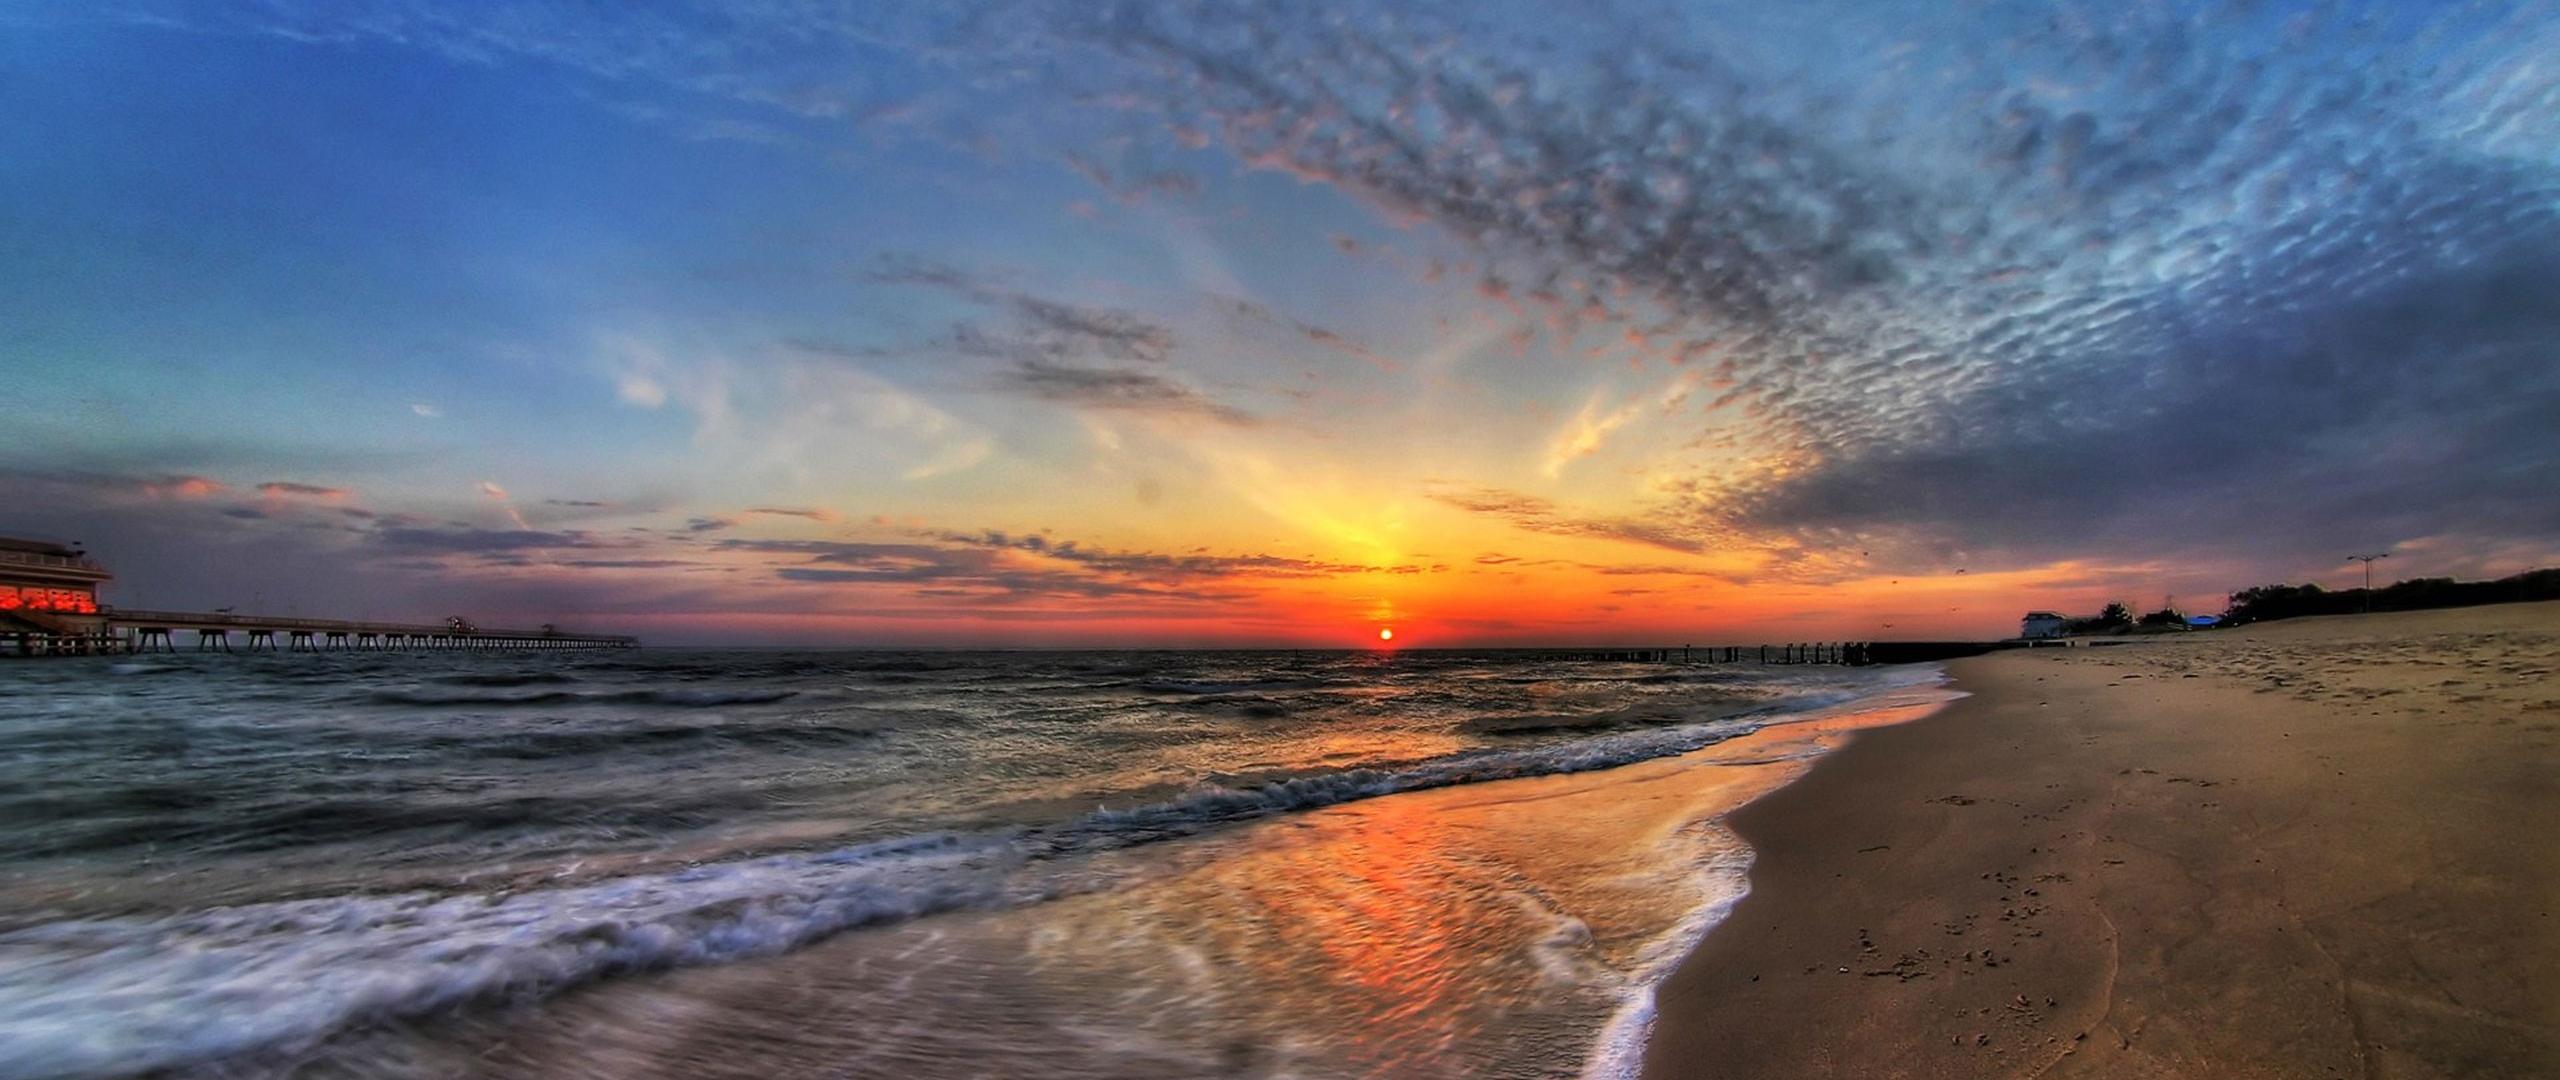 Sun Beach And Sea Wallpaper: 2560x1080 HD Wallpaper